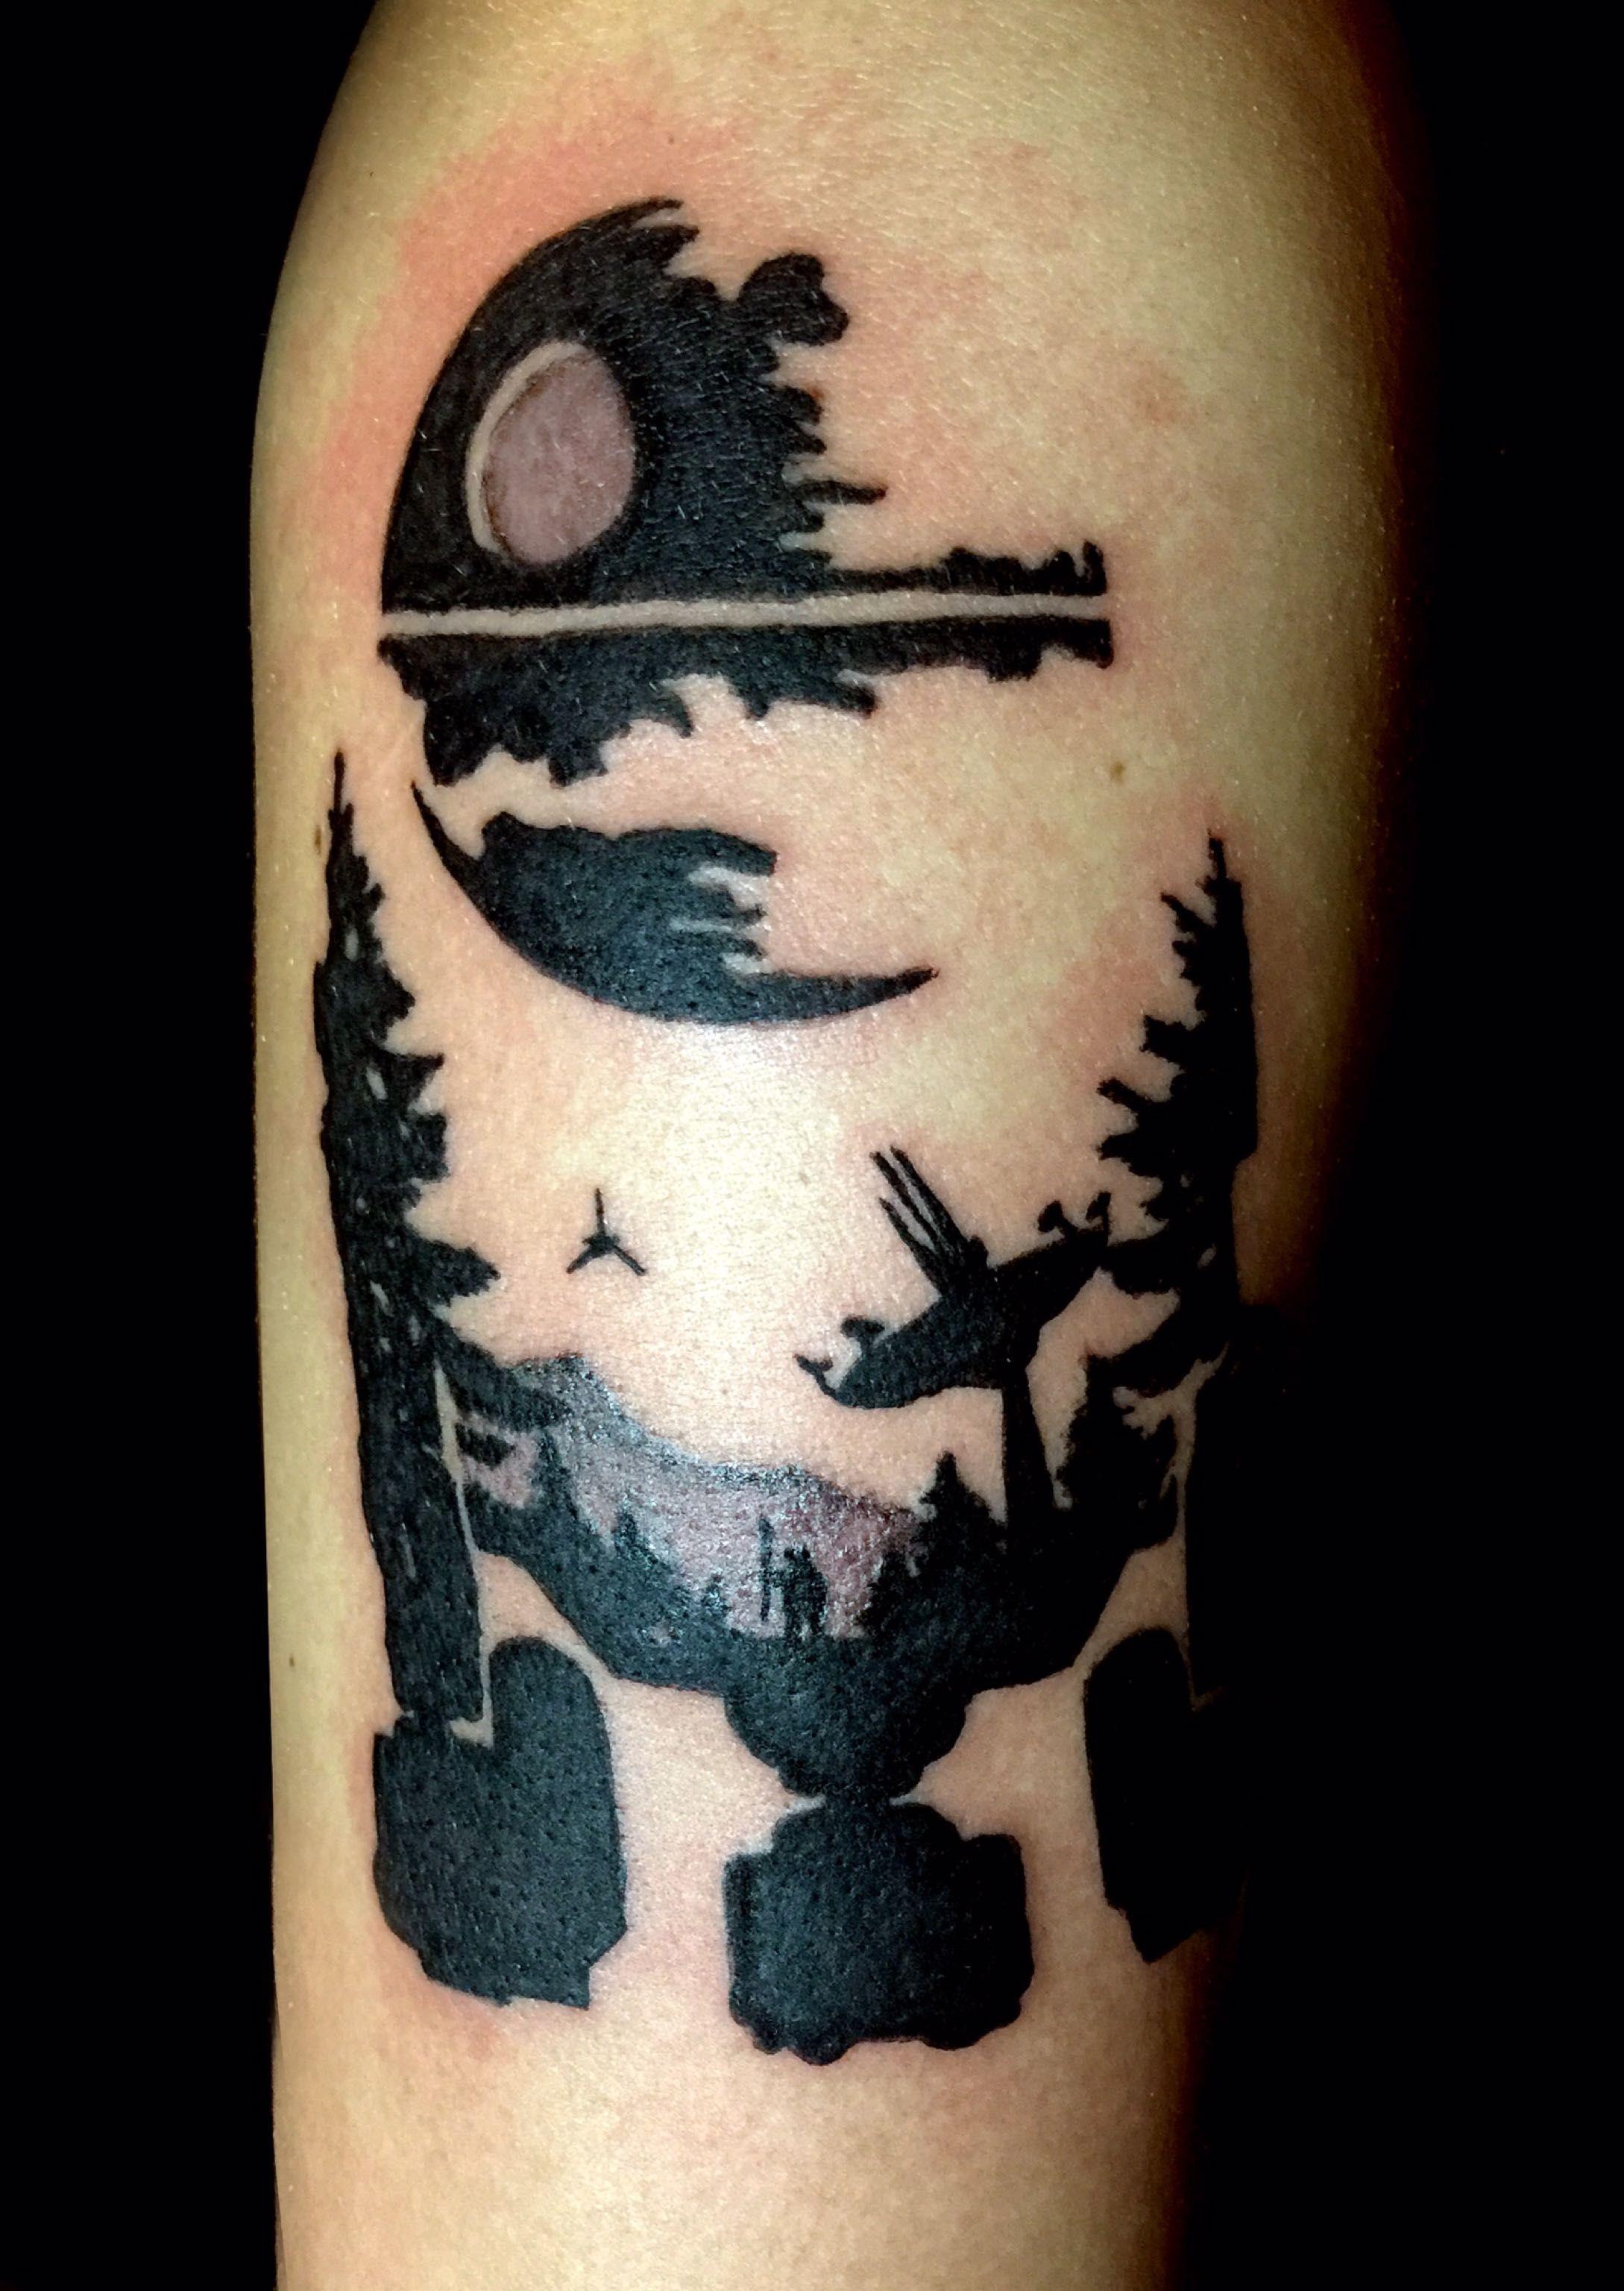 Image result for star wars tattoos star wars tats for Matching star wars tattoos